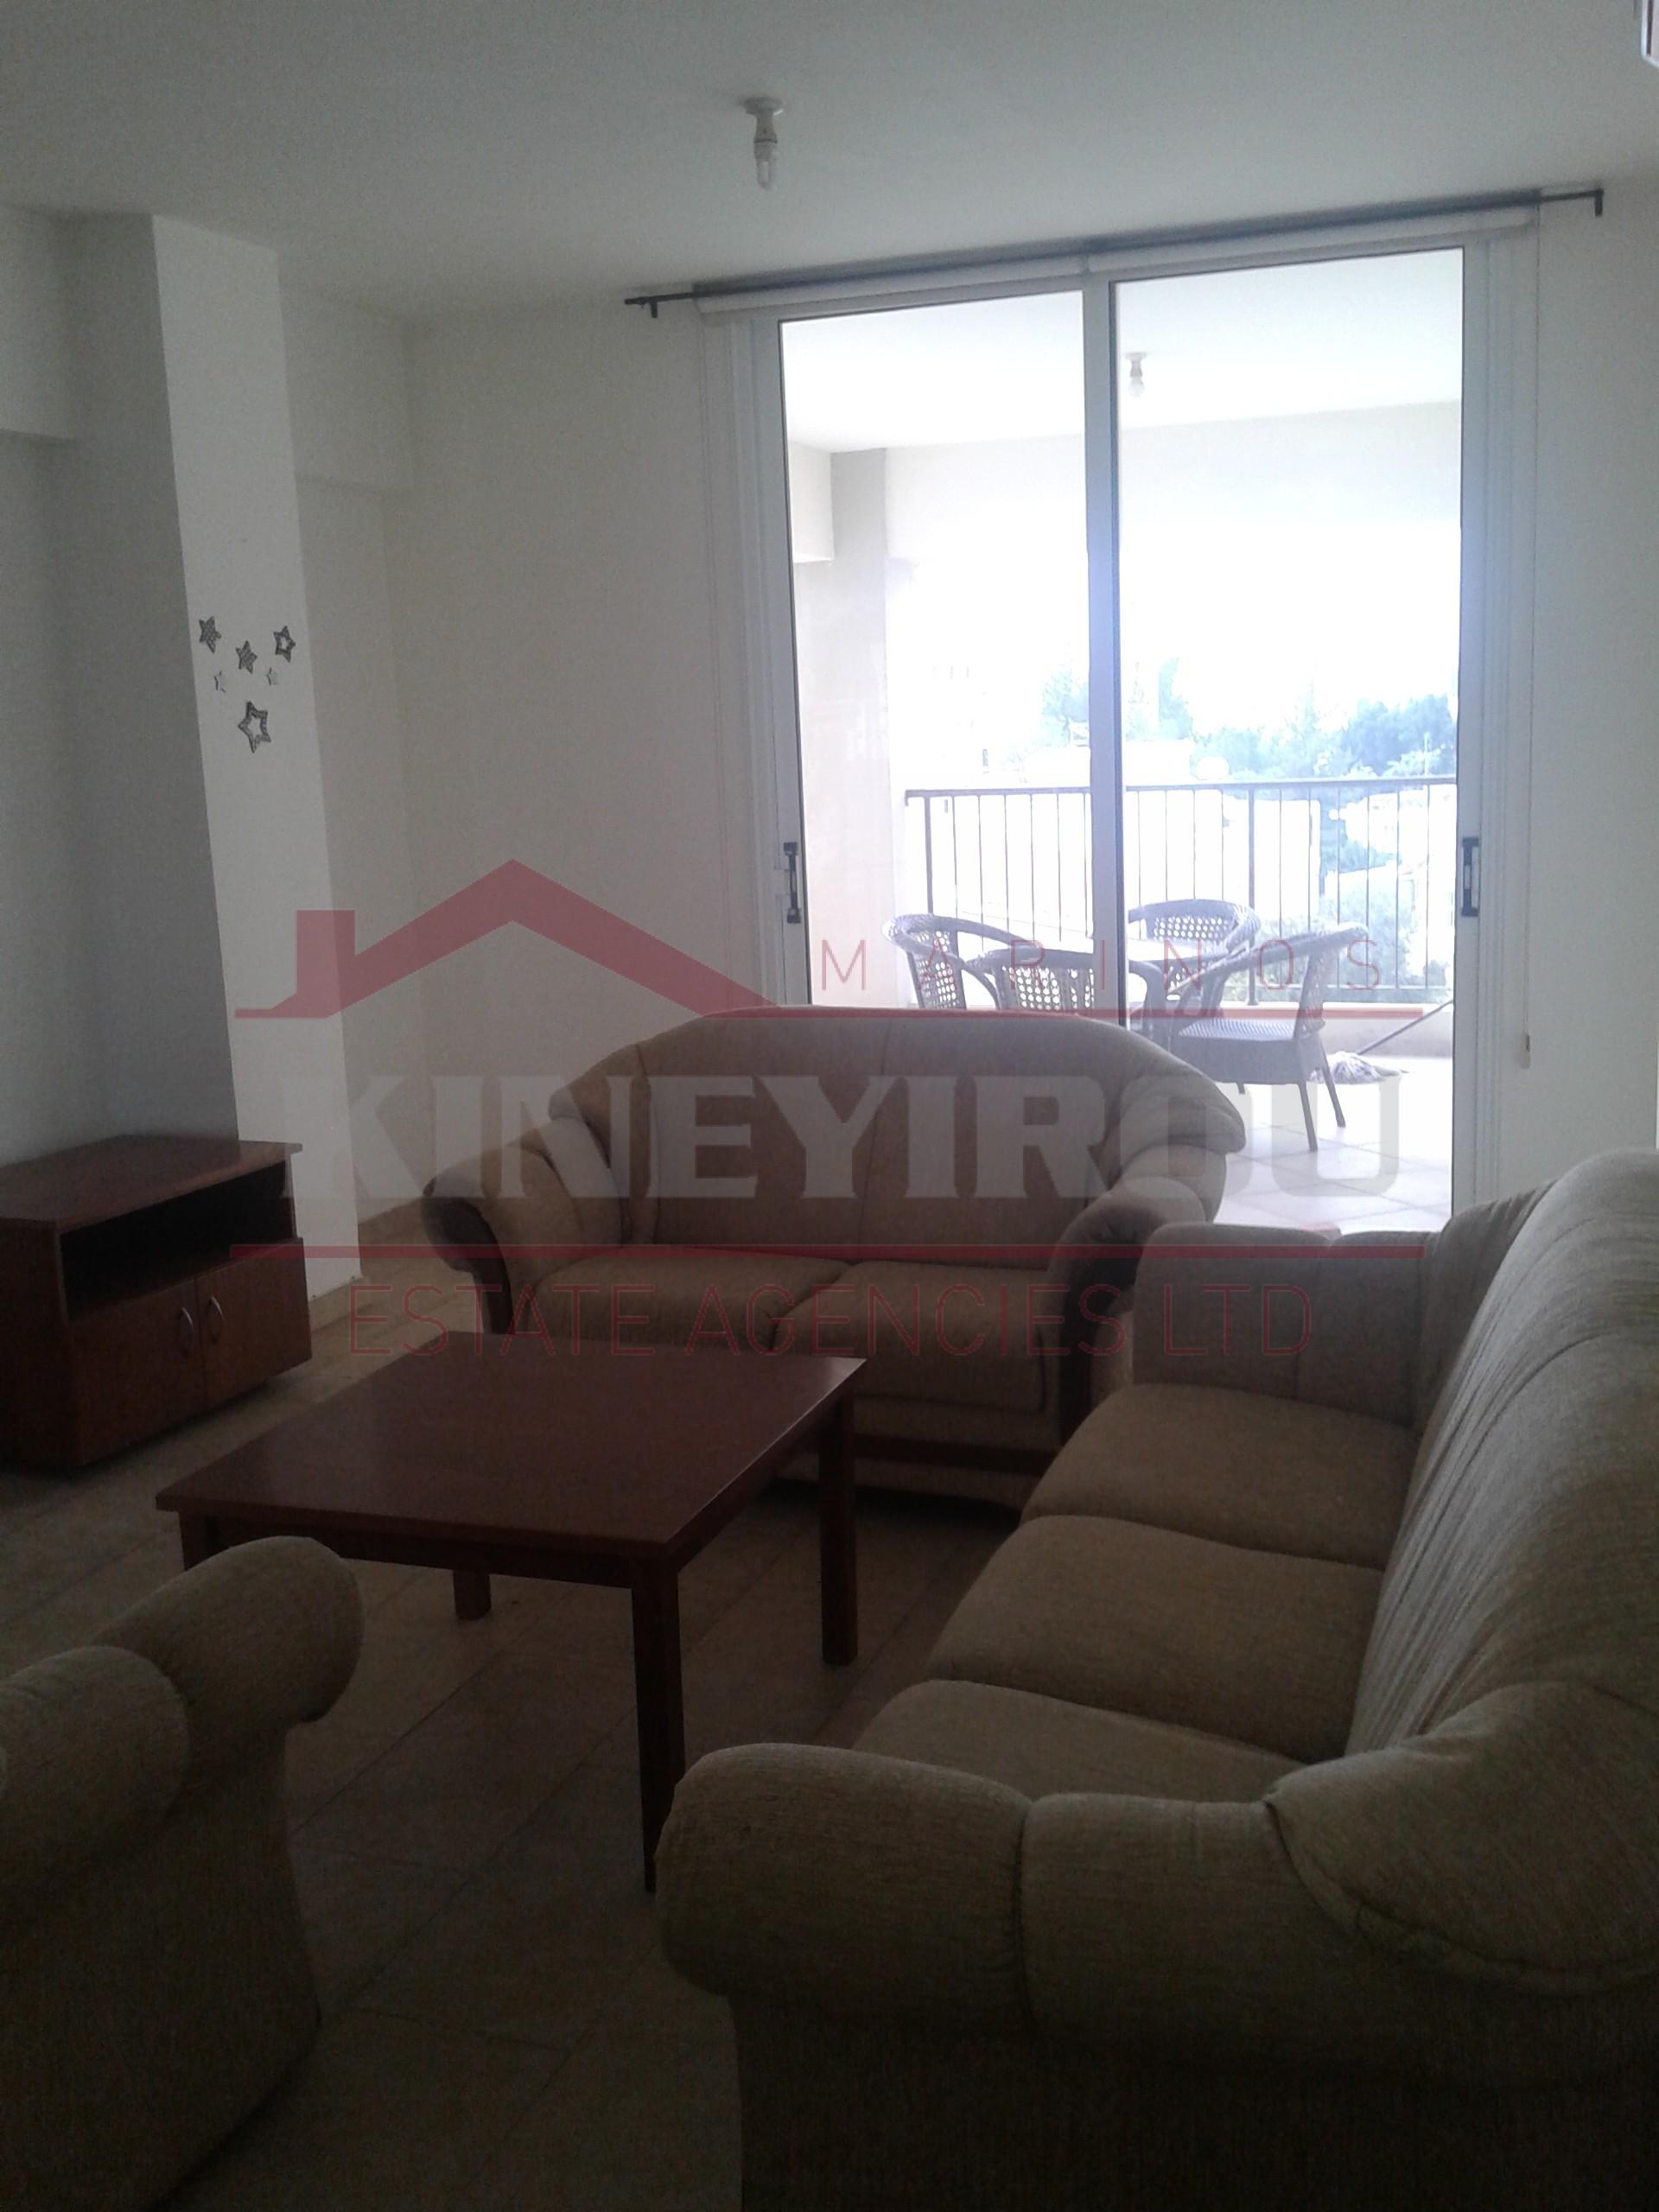 2 bedroom apartment for rent in Prodromos – Larnaca